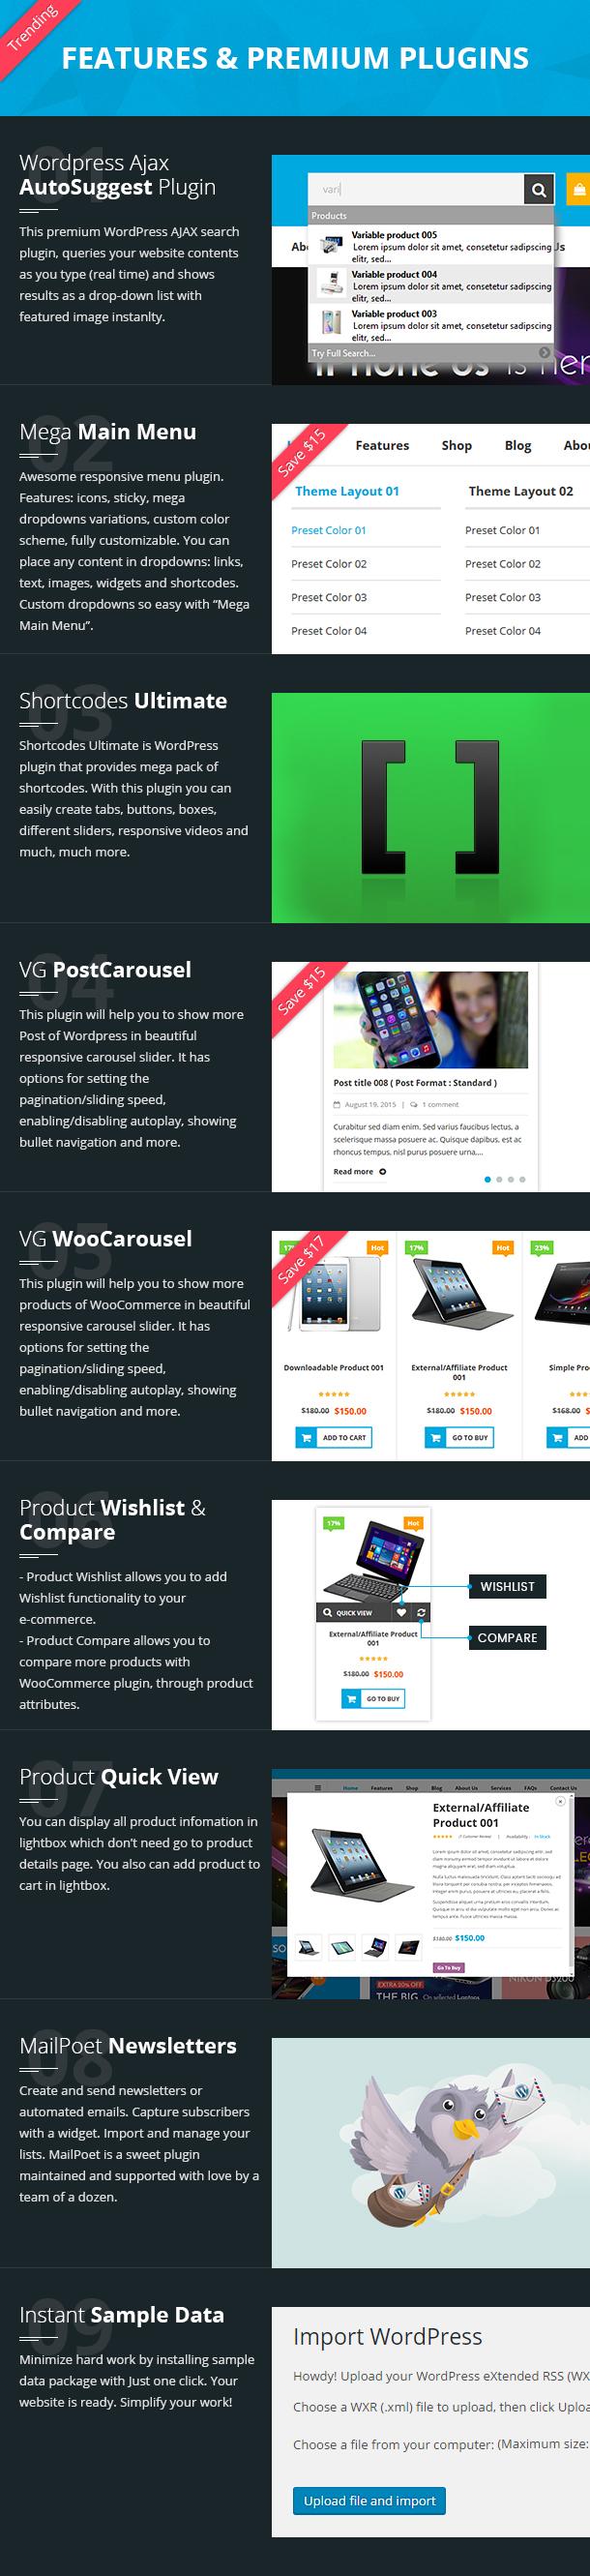 VG Selphy - Responsive WooCommerce WordPress Theme - 33